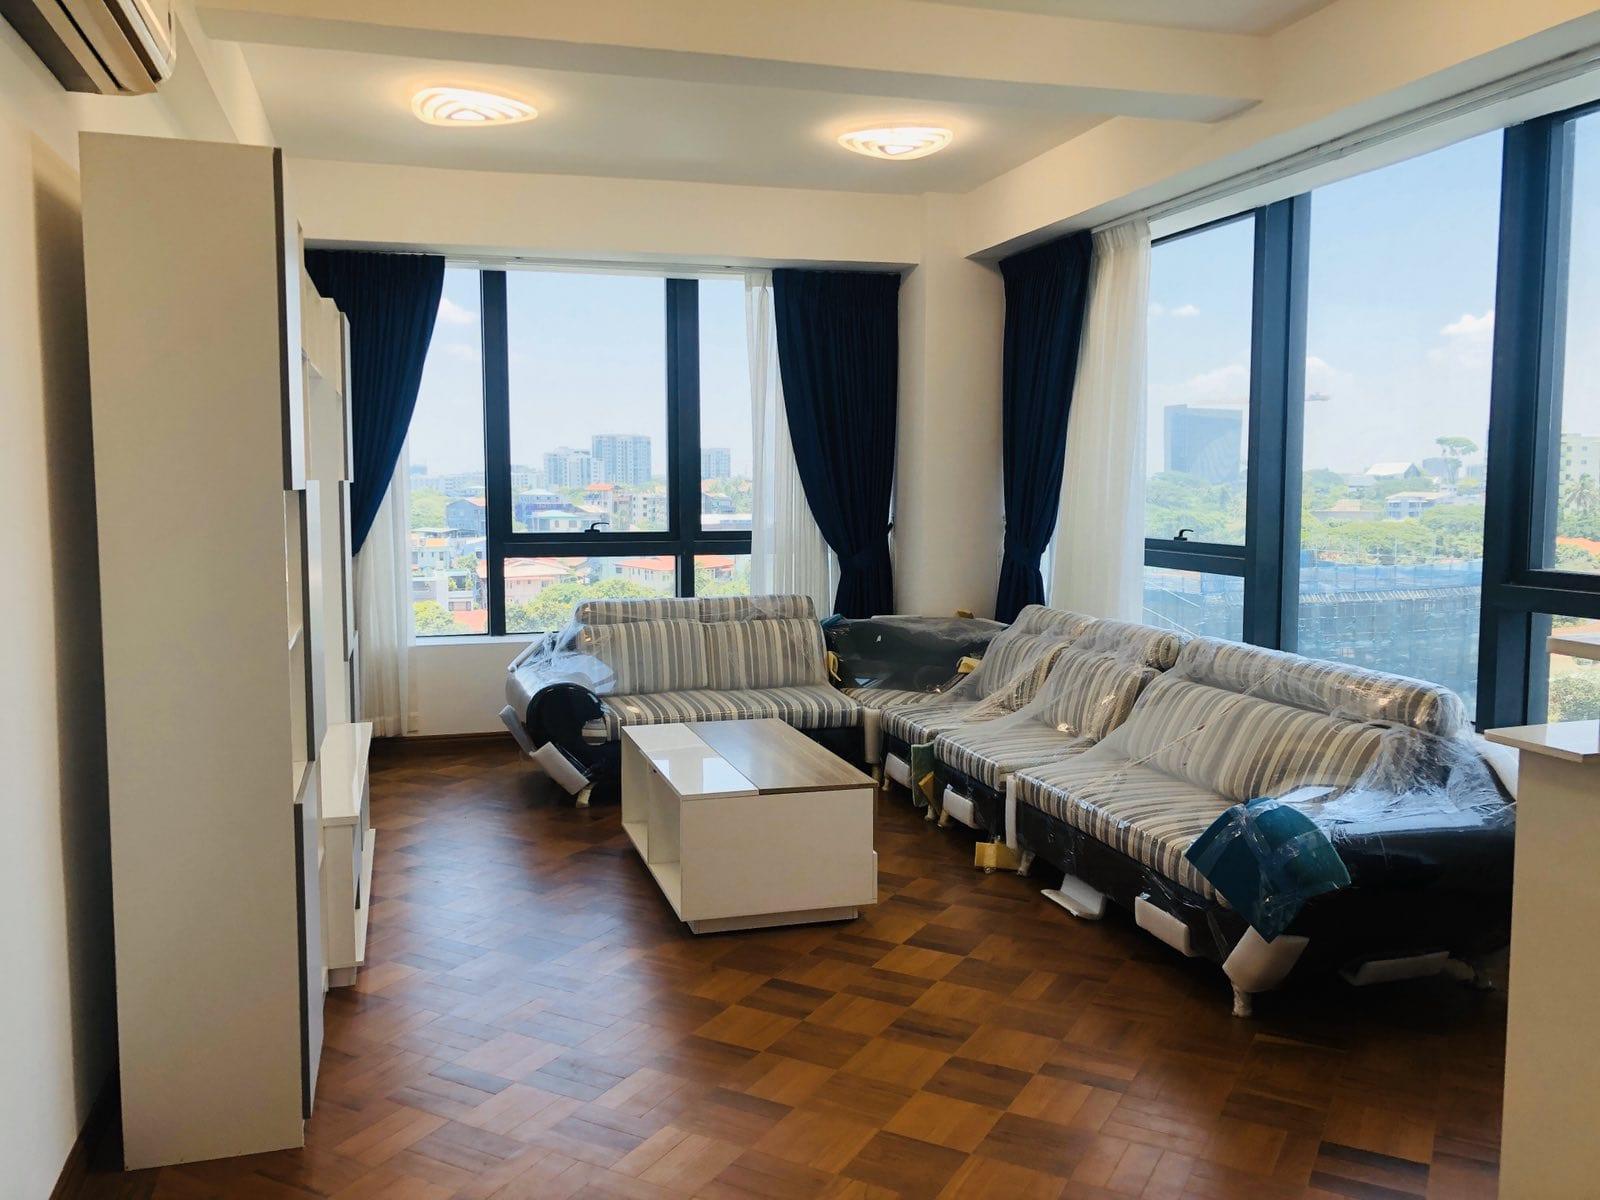 Three-Bedroom Condo in Hlaing Township